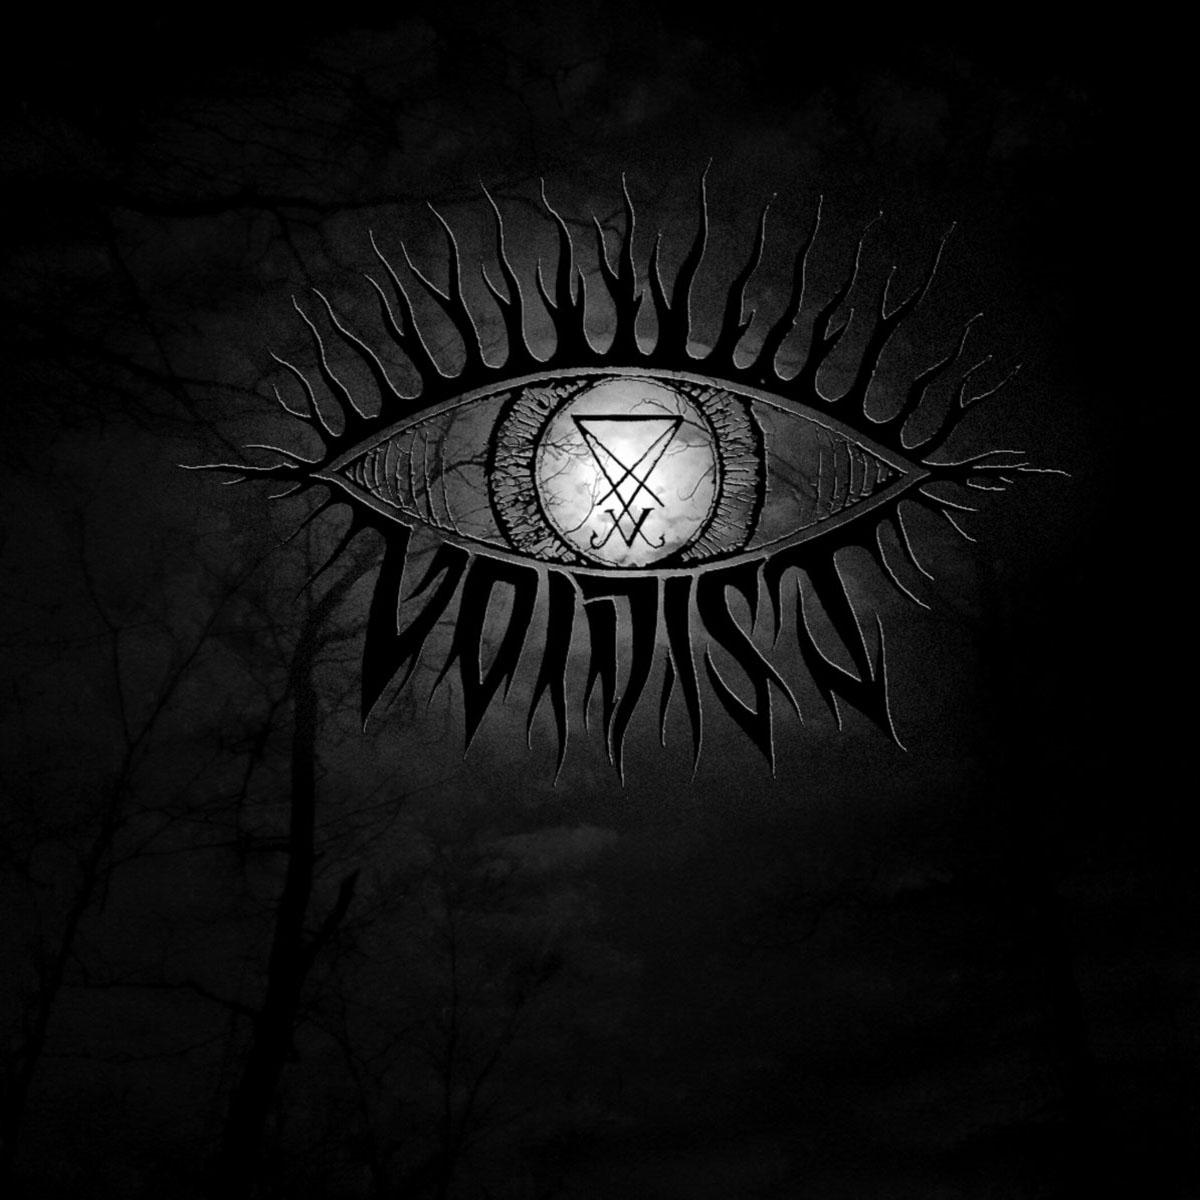 Voidist - The Great Conspiracy